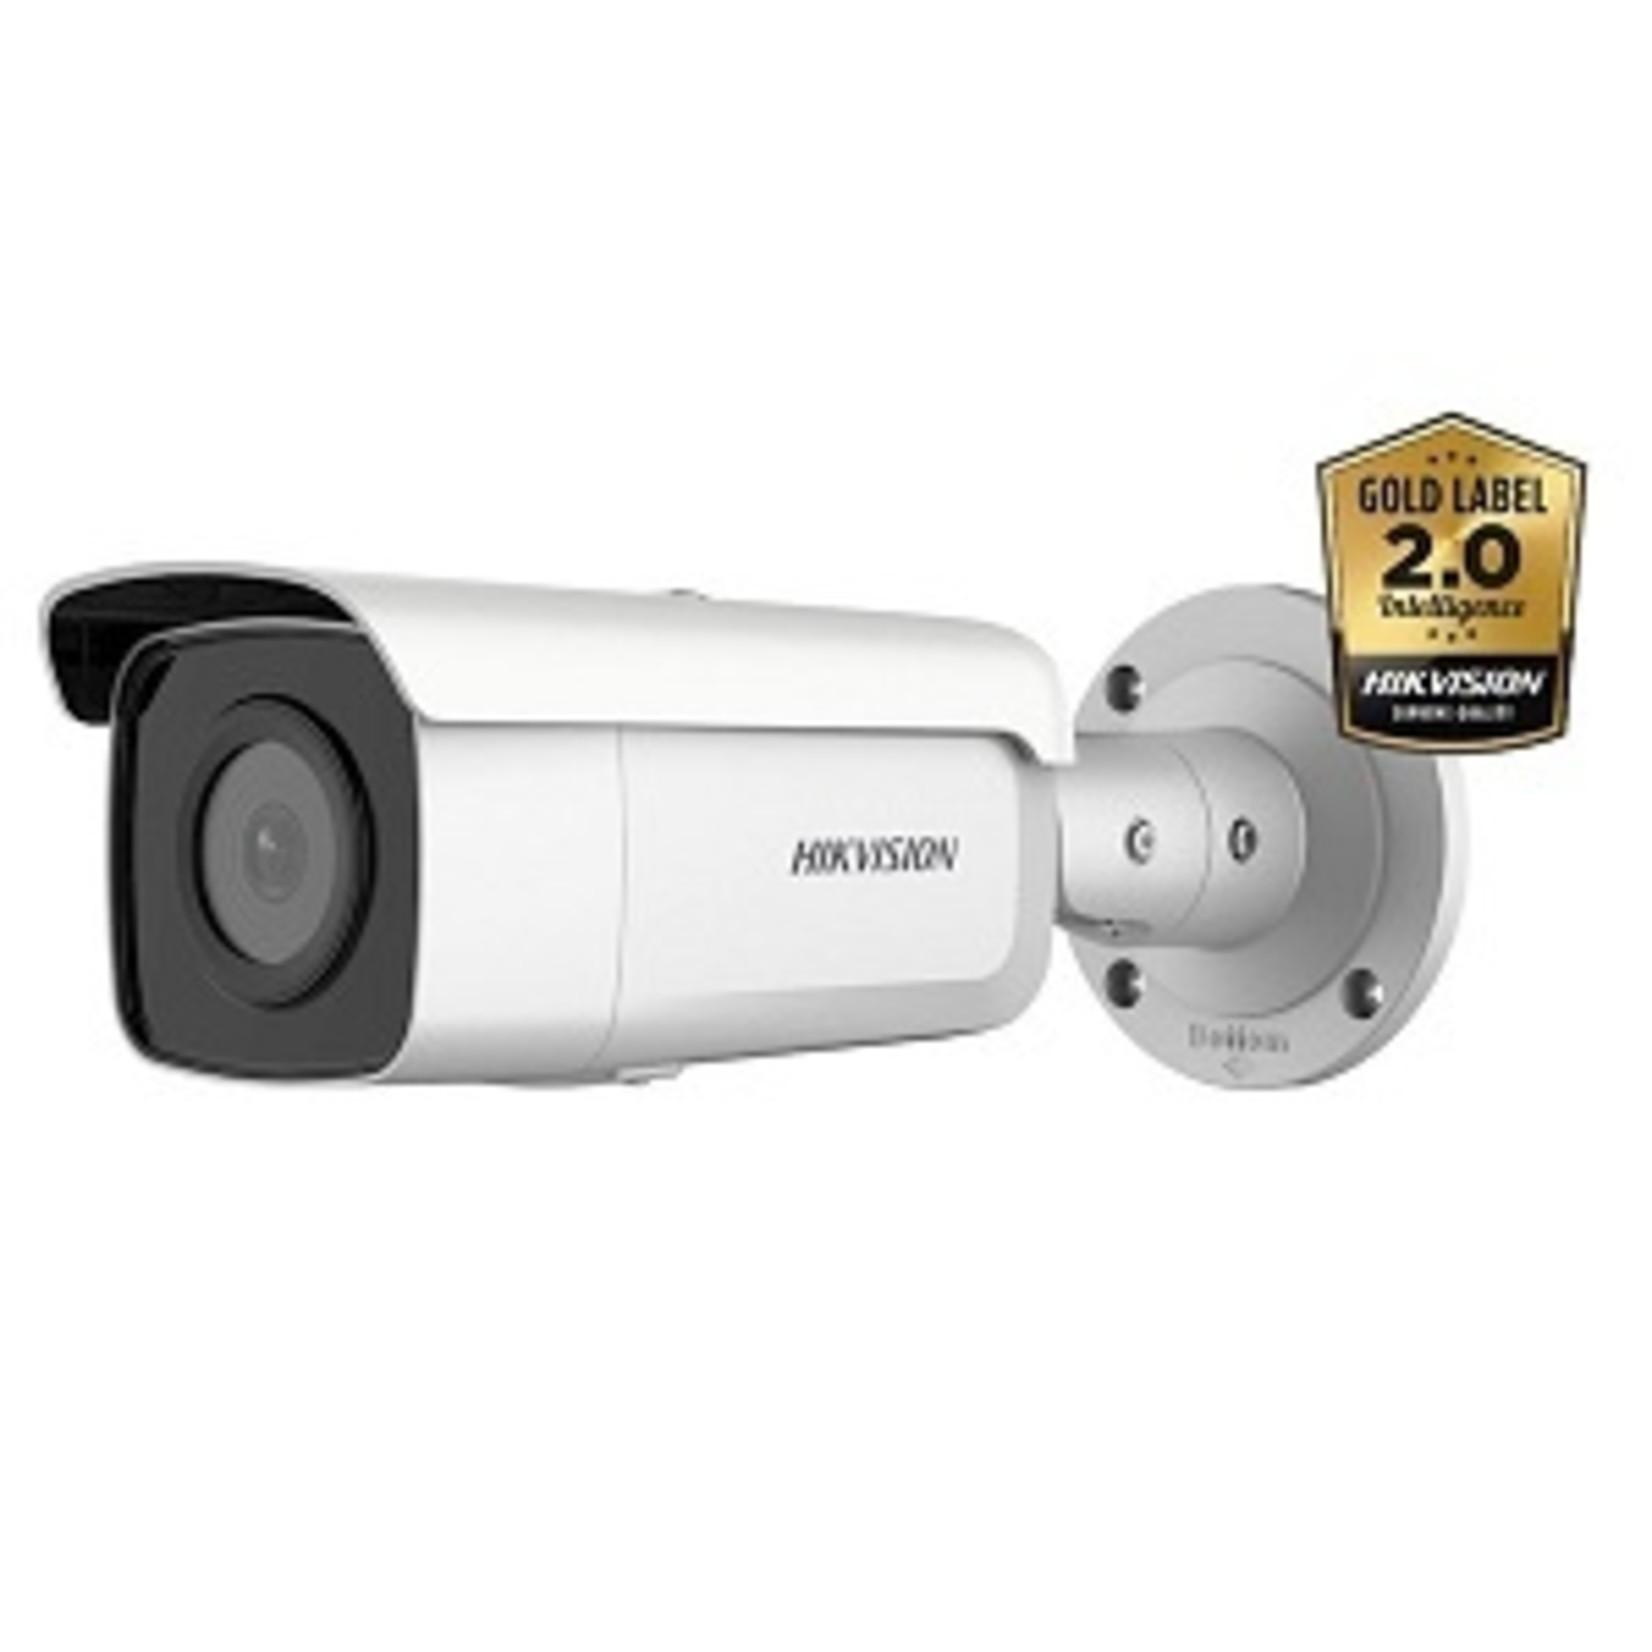 Hikvision DS-2CD2T46G2-4I, 4MP, 80m IR, WDR, Ultra Low Light